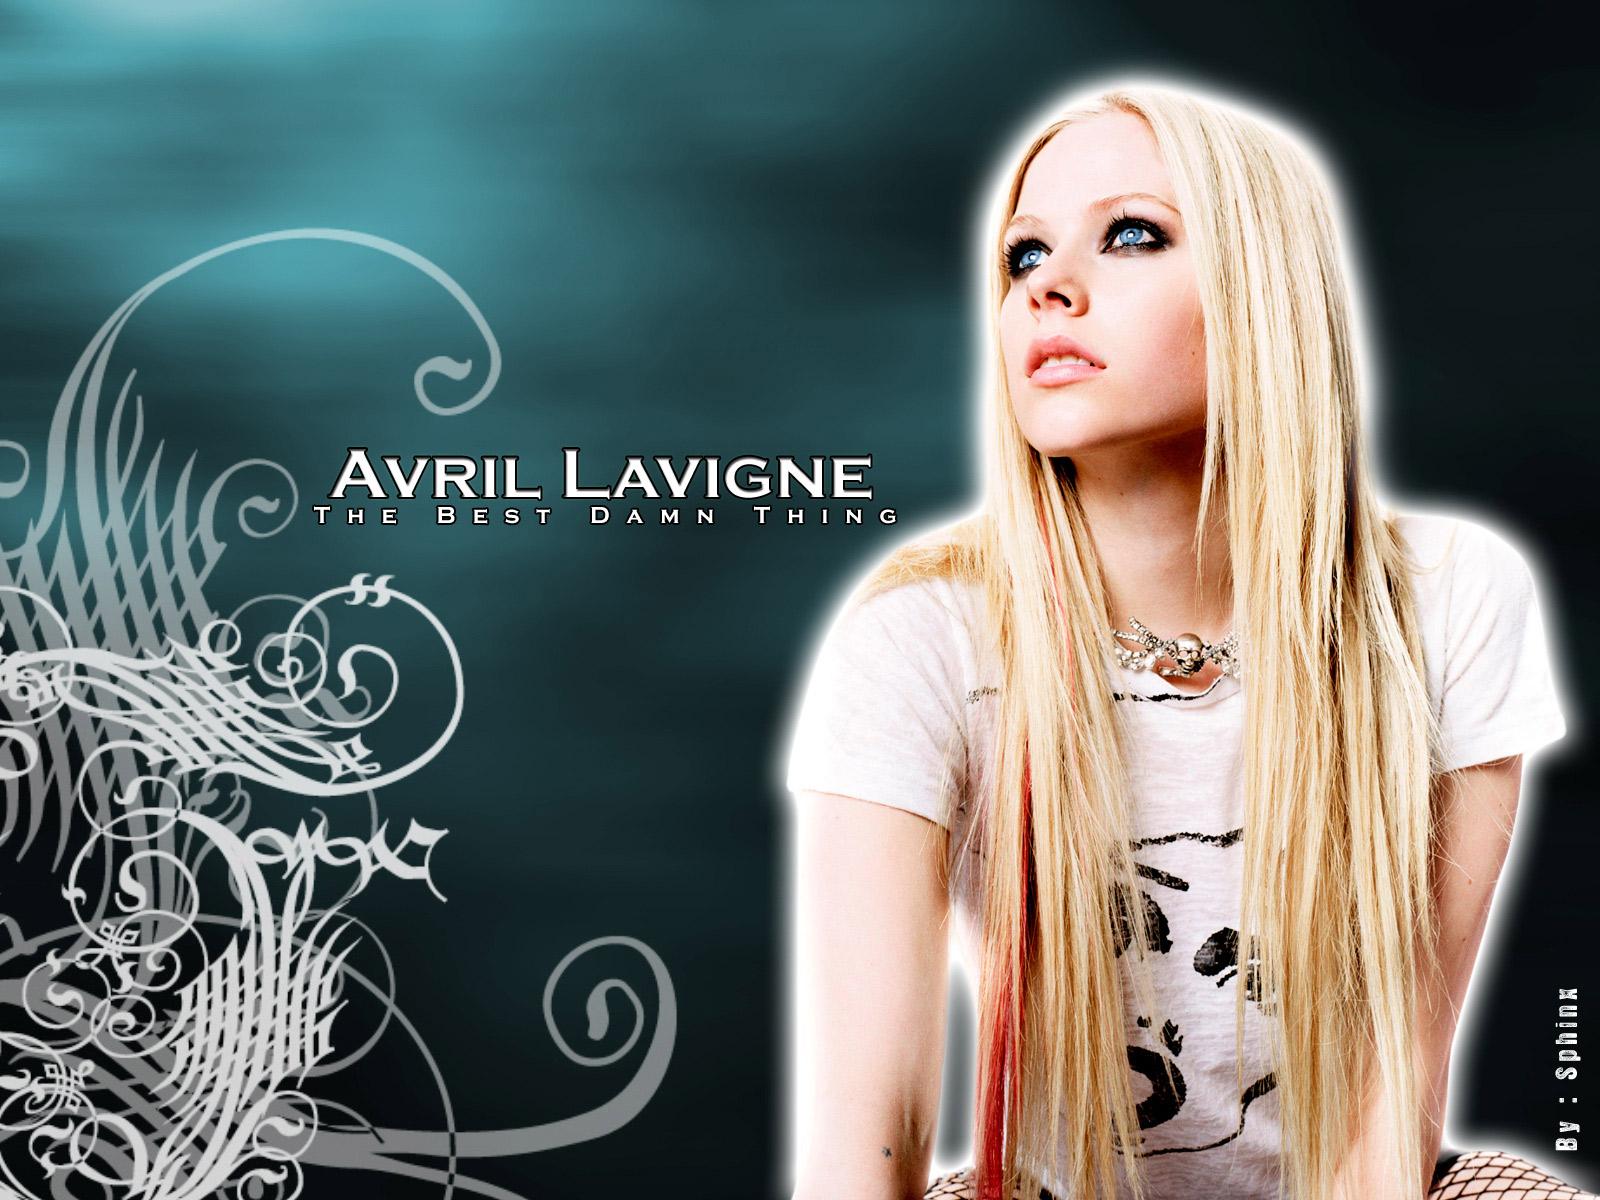 http://3.bp.blogspot.com/-TAPsw2RHAEs/T-Ik_PxJ9vI/AAAAAAAAABQ/-9zlpANwTwU/s1600/Avril+Lavigne+Wallpaper+%283%29.jpg